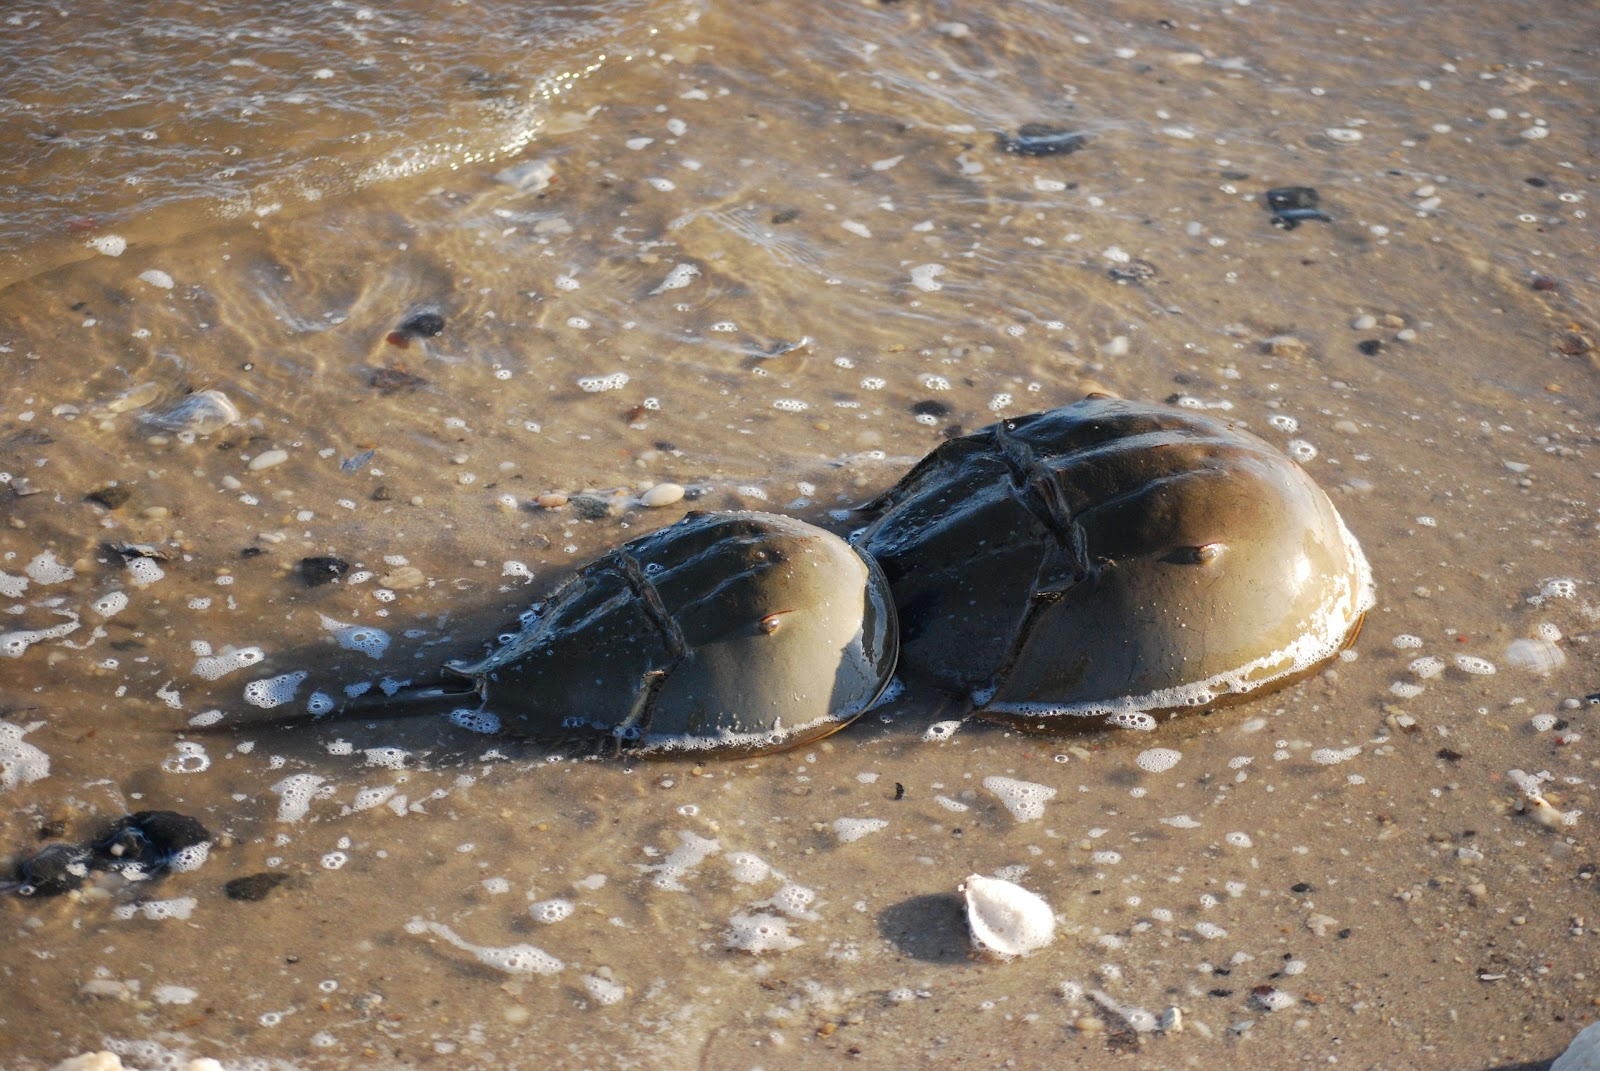 Horseshoe Crab | The Life of Animals